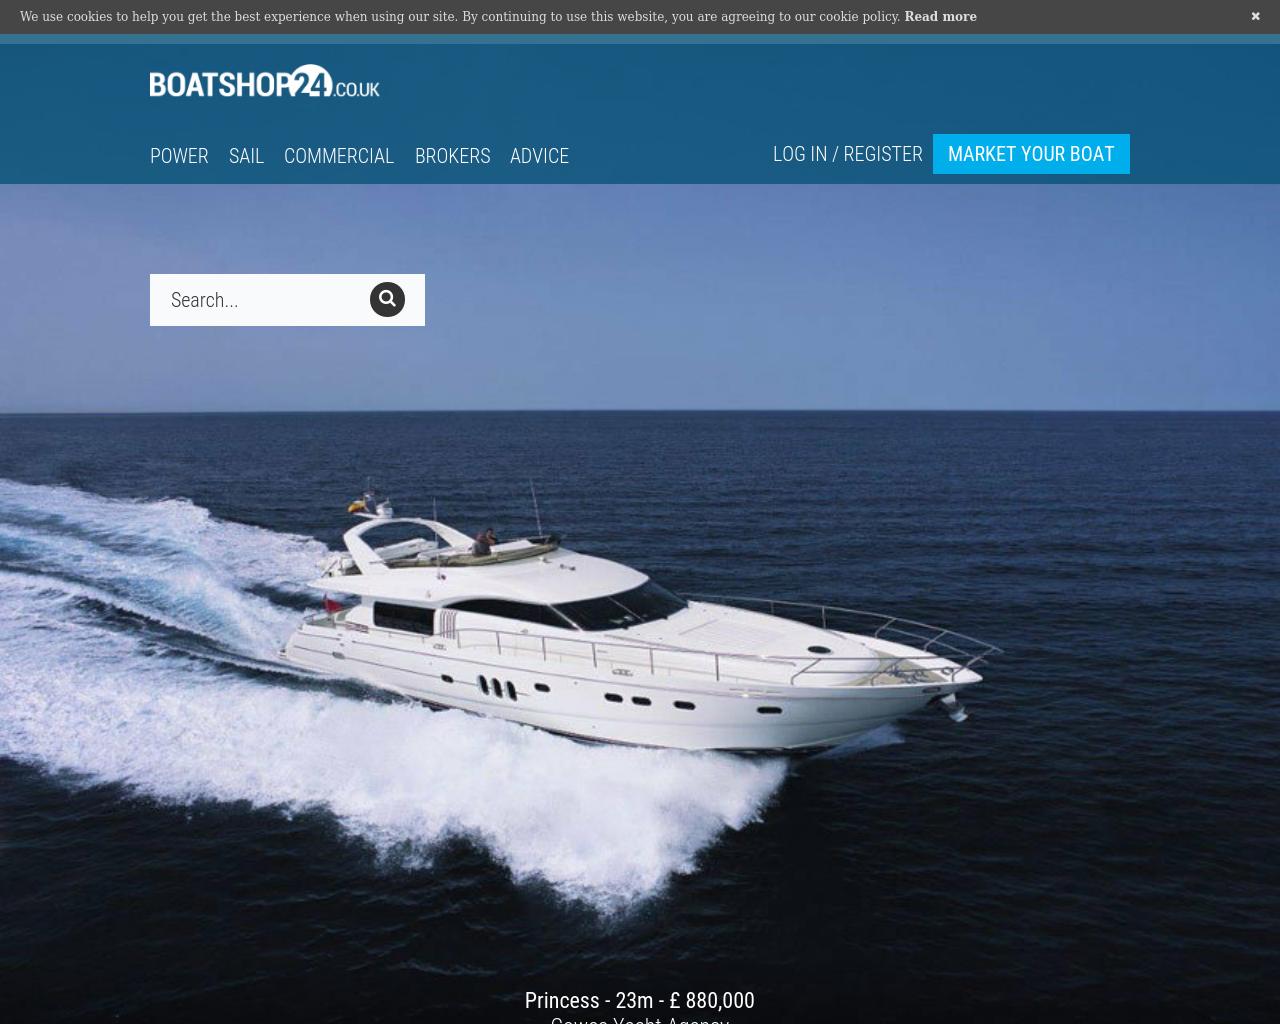 BOATSHOP24.CO.UK-Advertising-Reviews-Pricing